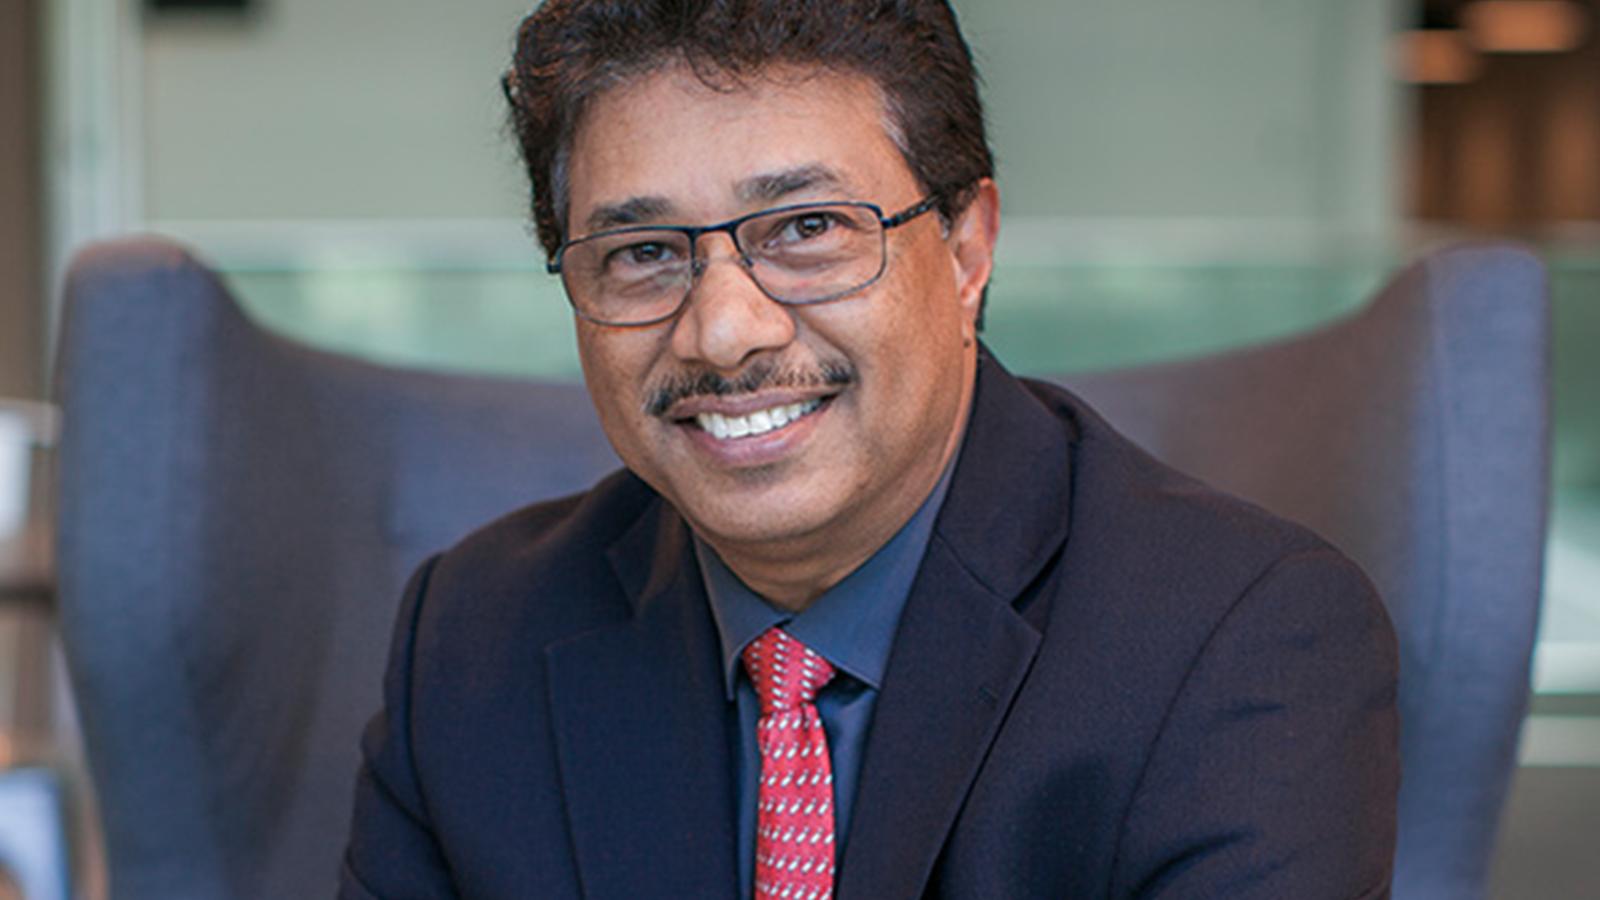 Raghwa Gopal President & CEO Innovate BC Press Release Jan 28, 2019